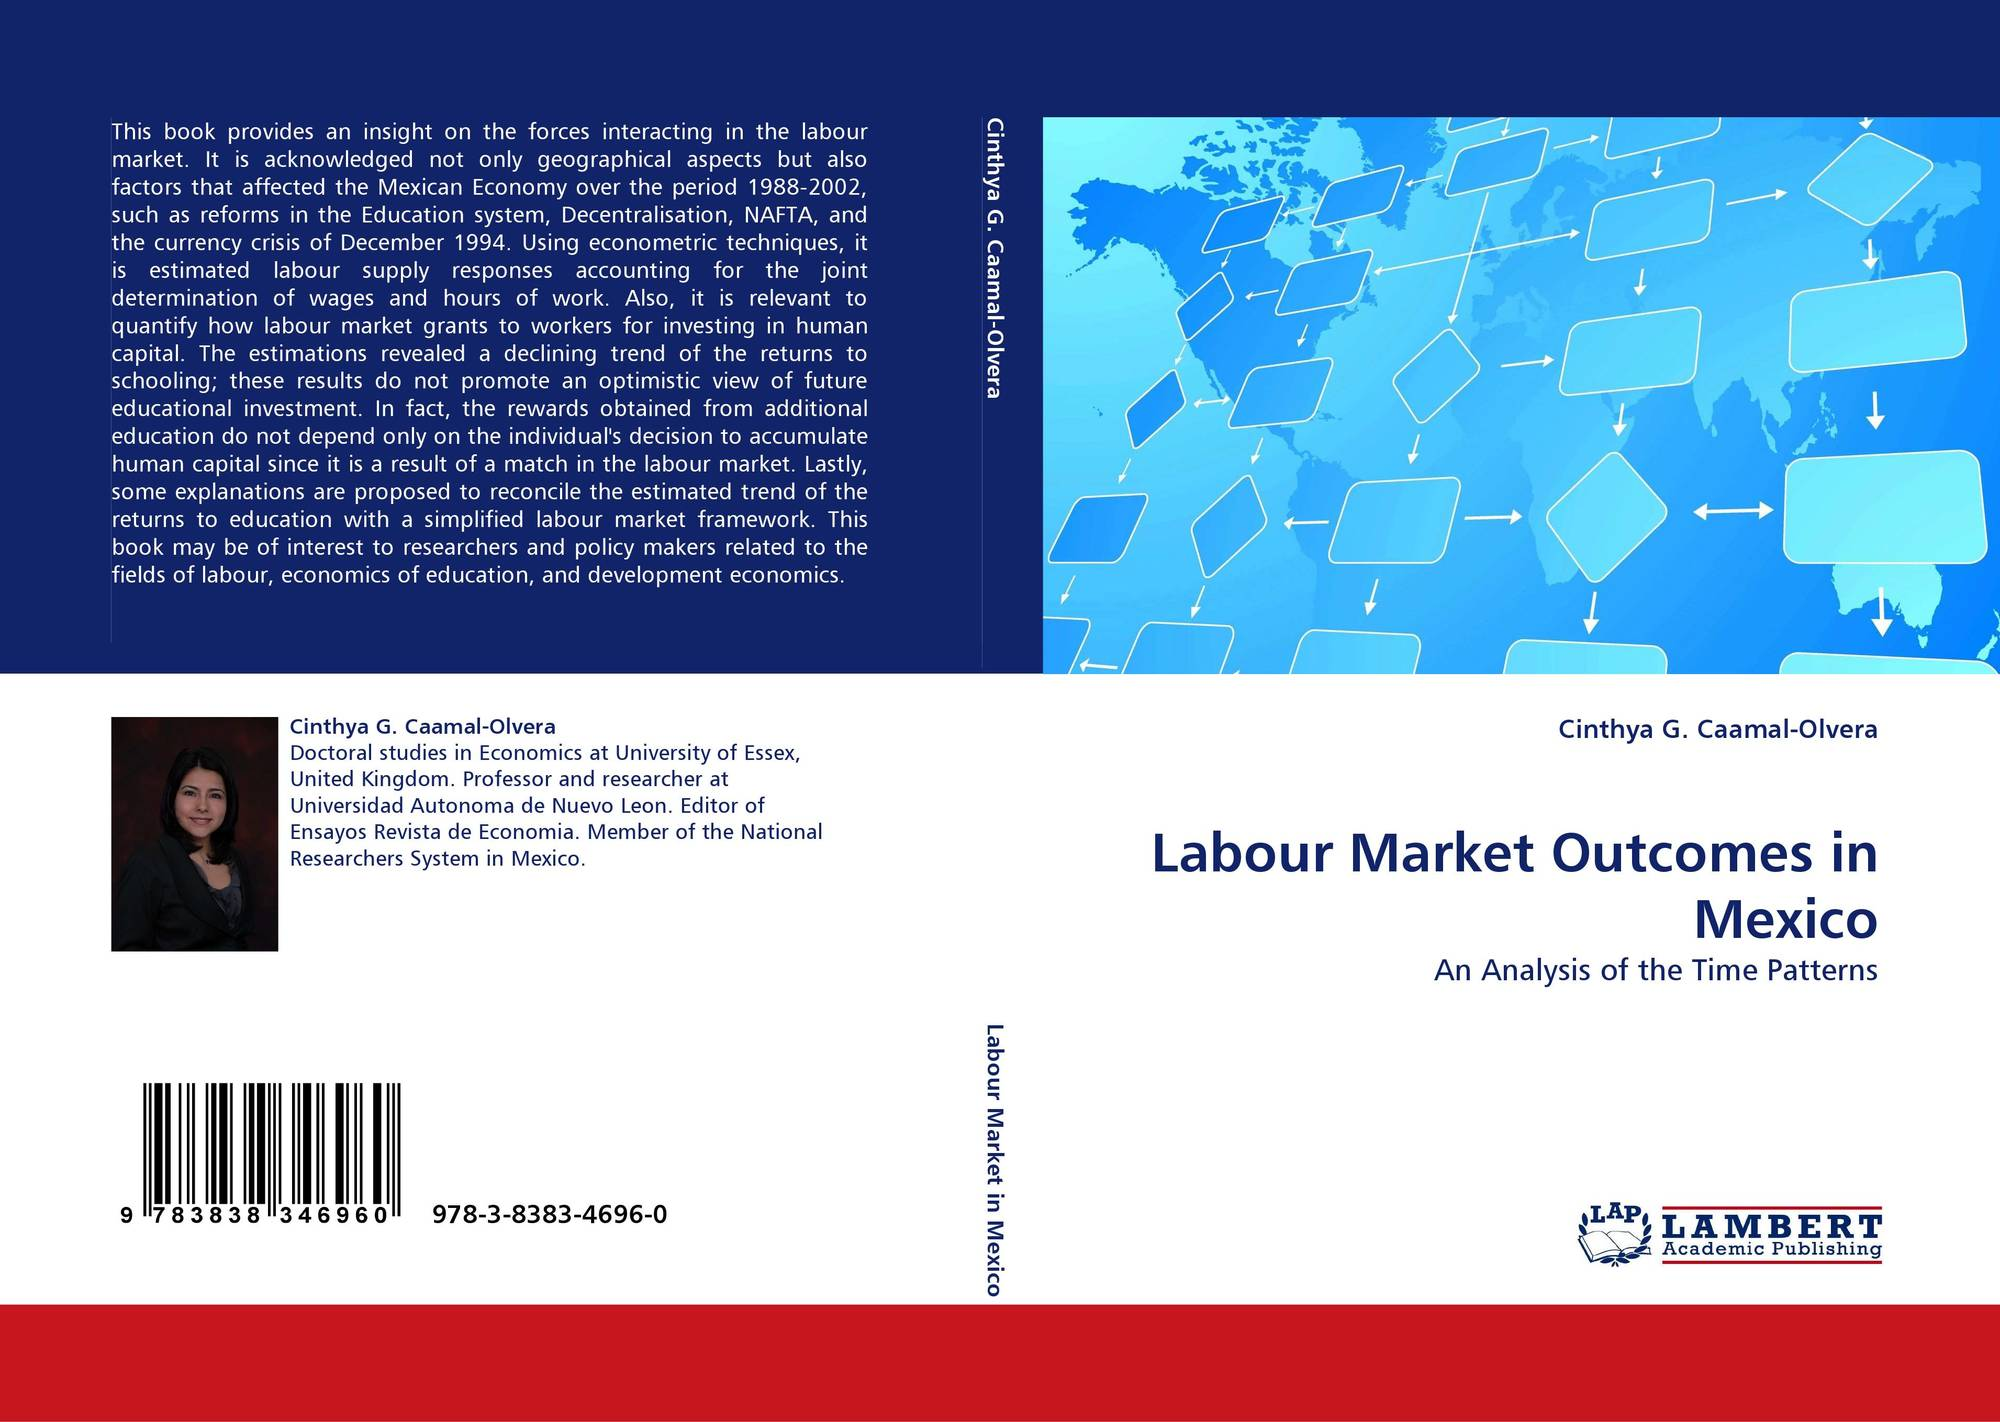 labour market outcomes 10 aug 2017 - speakers: moderator: dino corell, programme analyst at  international labour organization (ilo) @dinocorell @ilo.